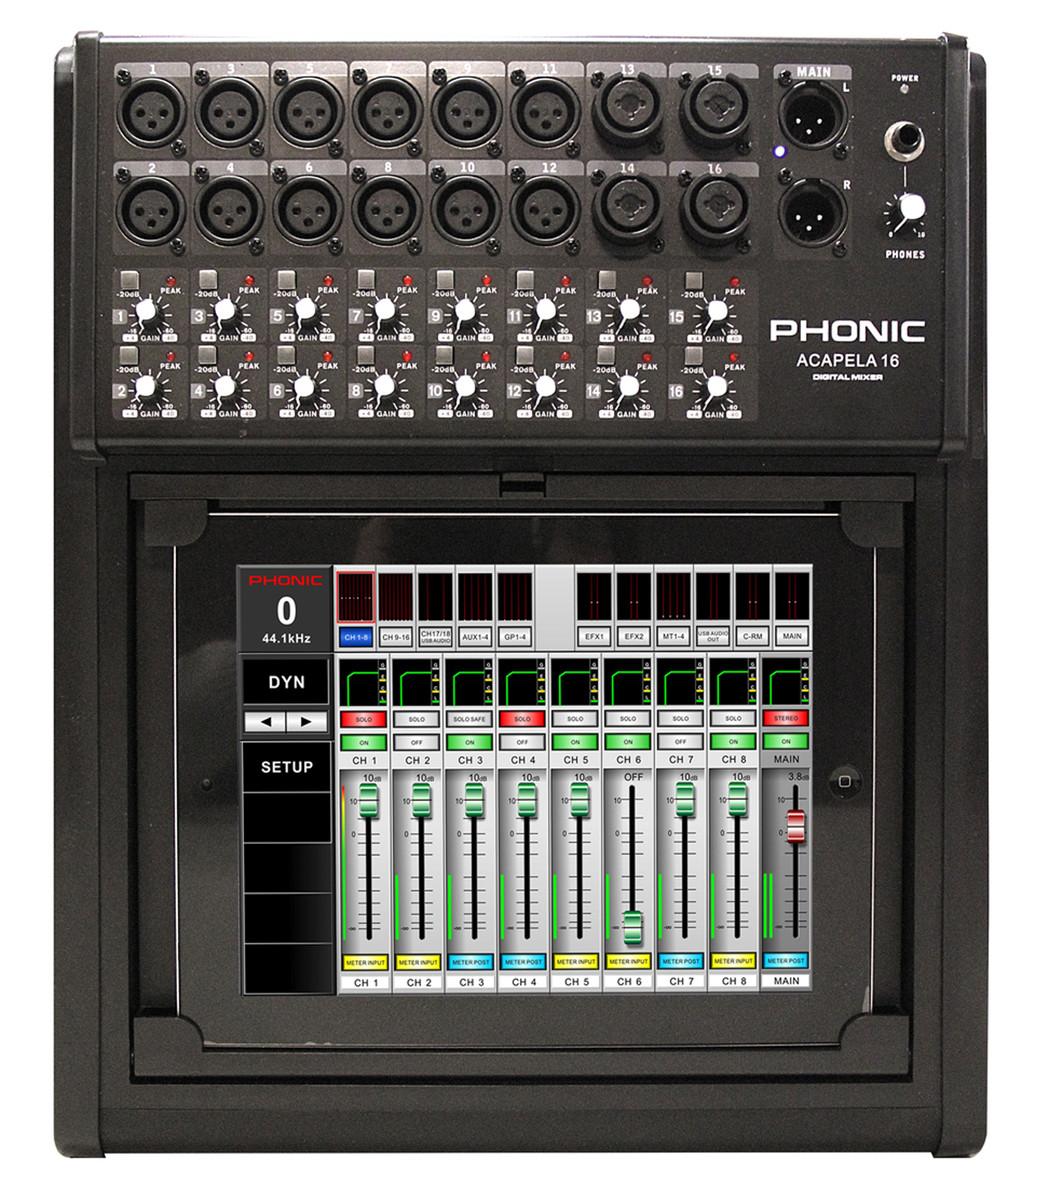 phonic acapela 16 digital live sound mixer at. Black Bedroom Furniture Sets. Home Design Ideas